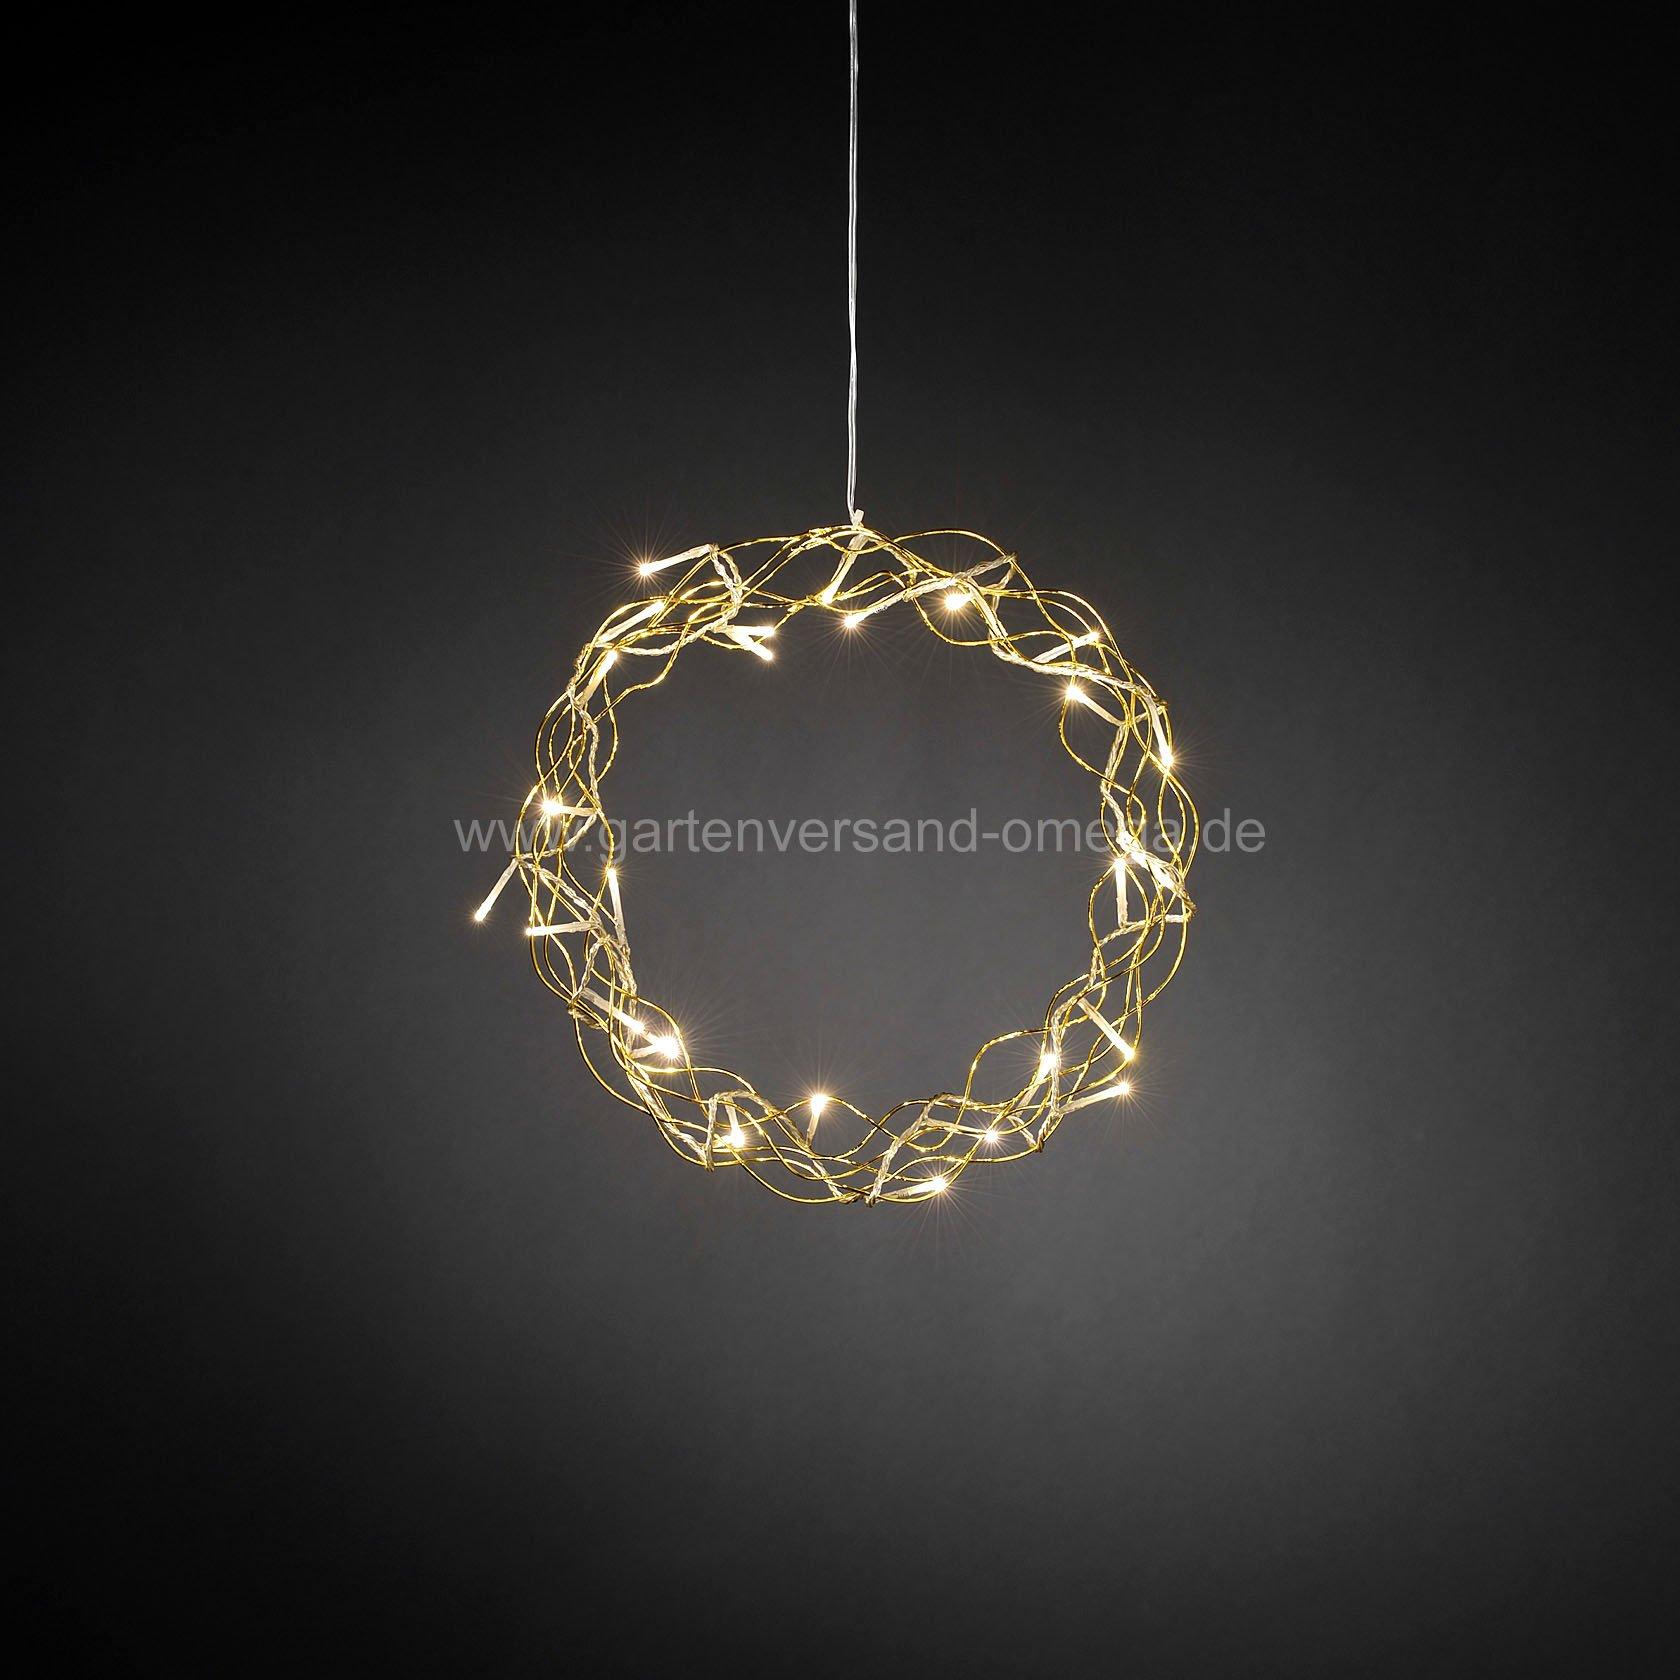 led metallsilhouette kranz gold leuchtende fensterdeko. Black Bedroom Furniture Sets. Home Design Ideas